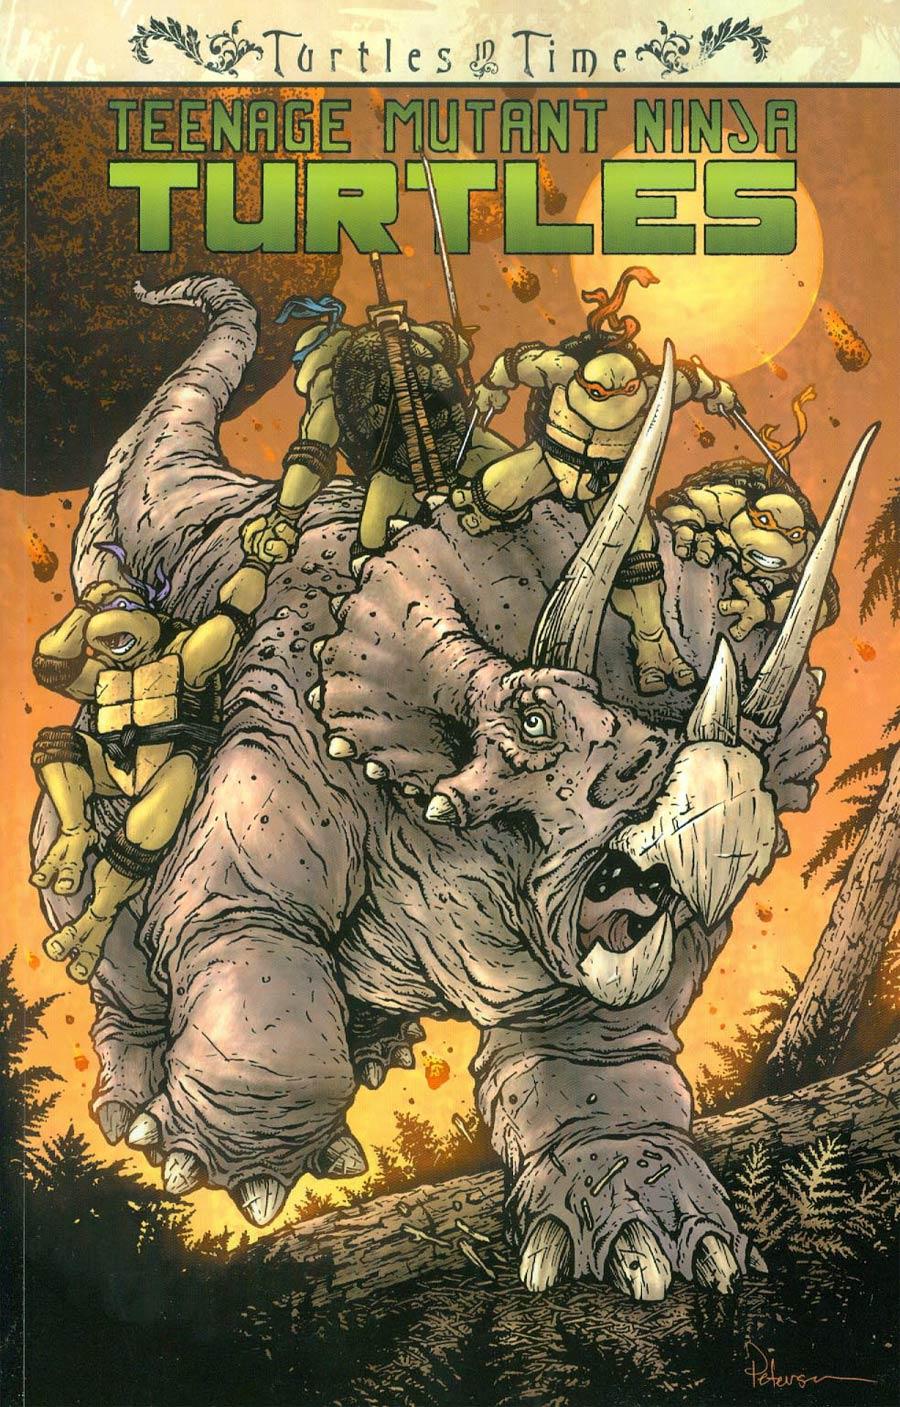 Teenage Mutant Ninja Turtles Turtles In Time TP